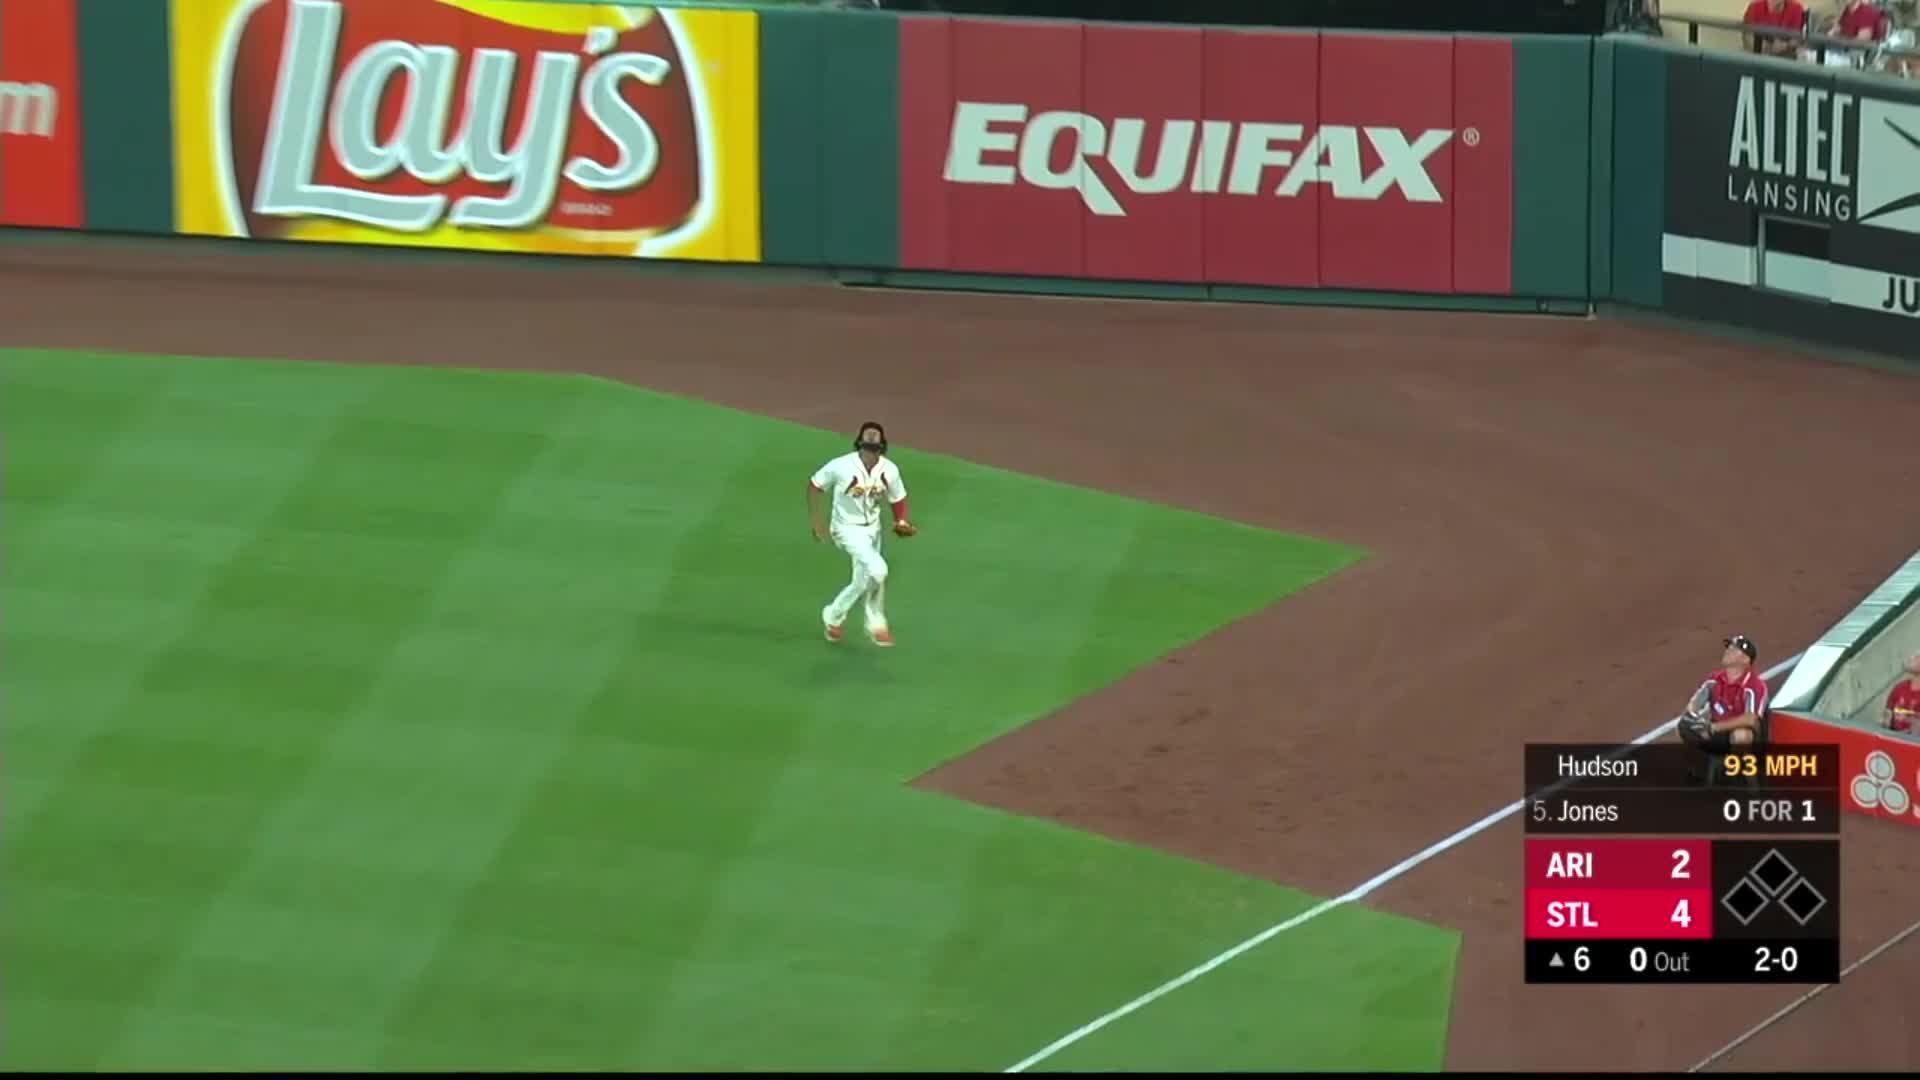 arizona diamondbacks, baseball, cardinals, st. louis, Jose Martinez taps ball man on head. GIFs